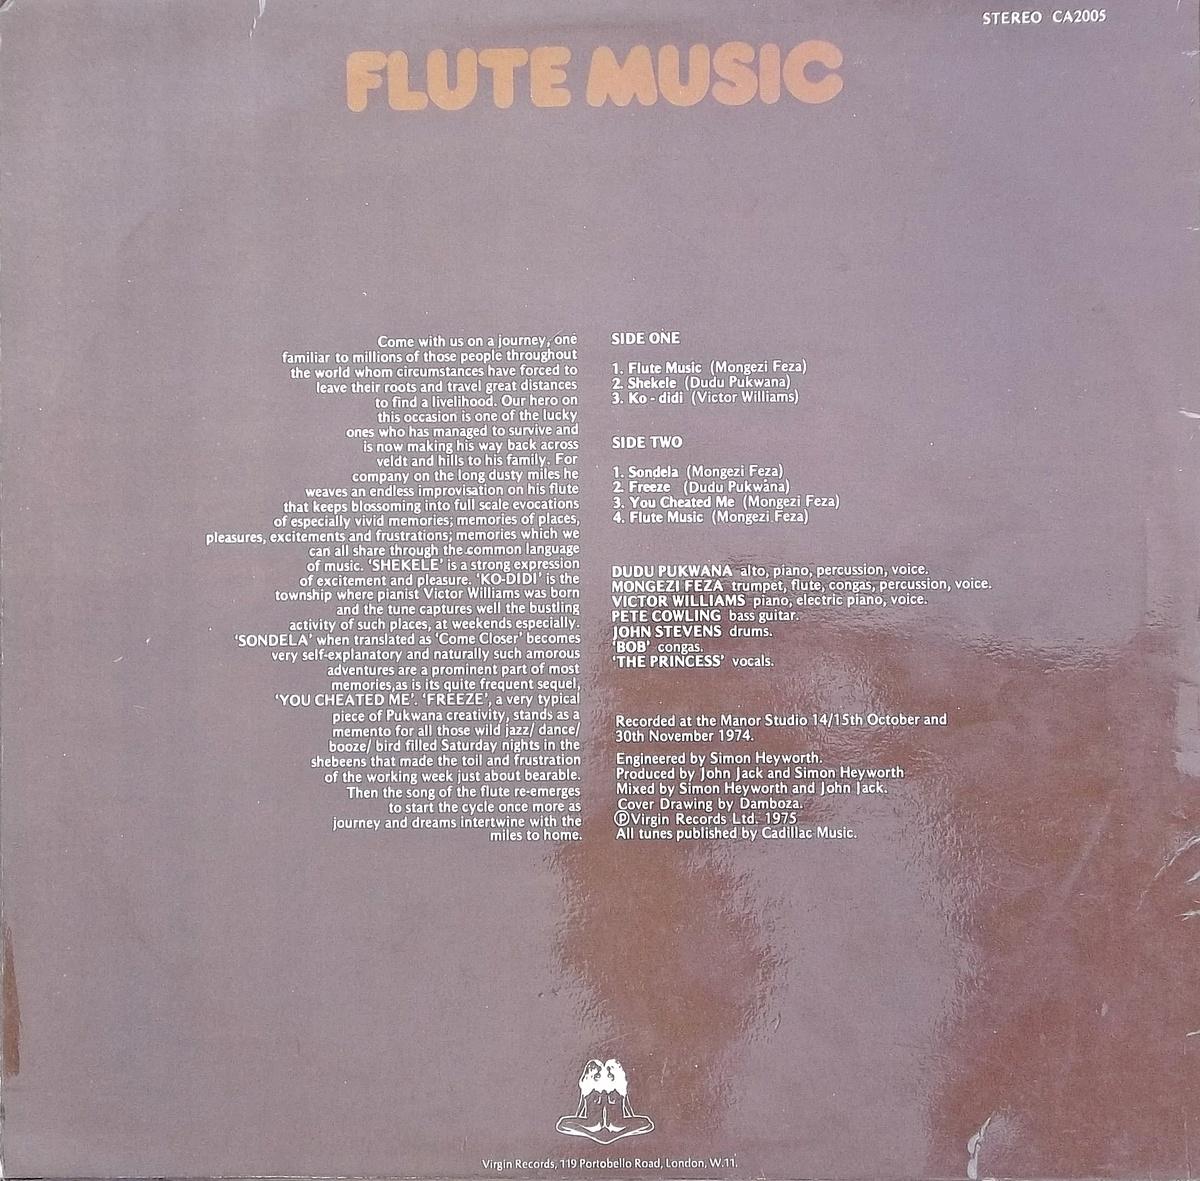 Dudu Pukwana Spear Flute Music